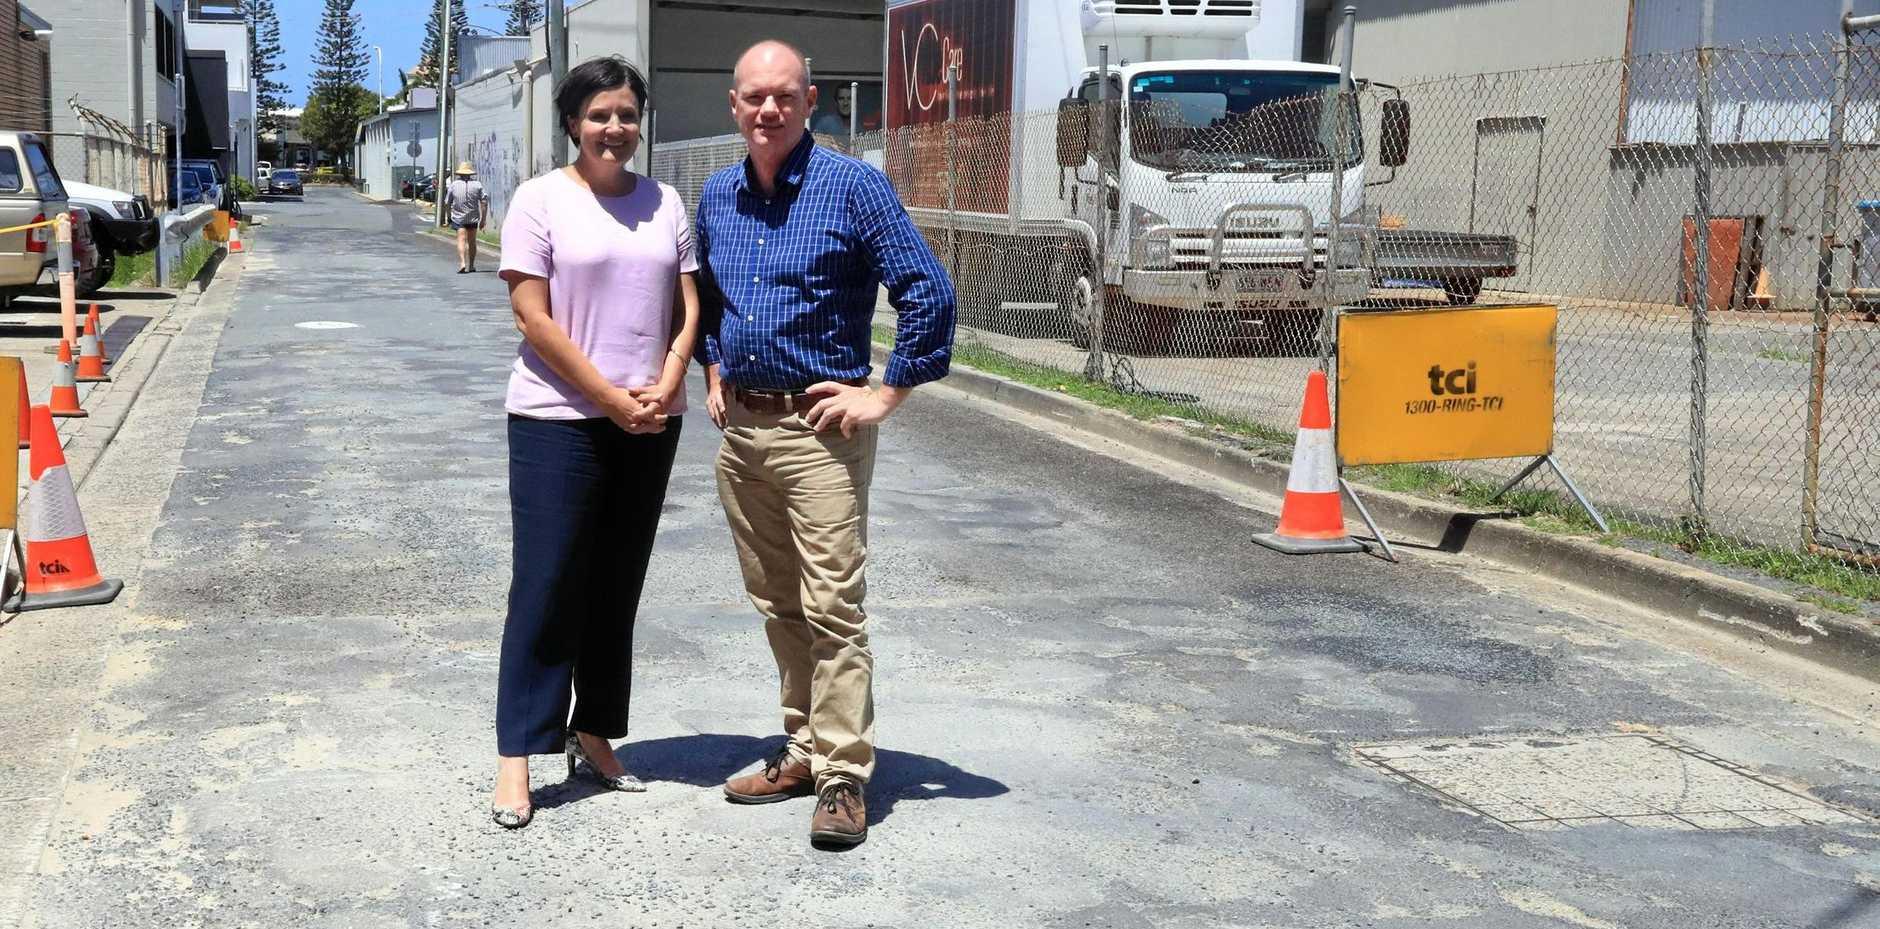 Jodi McKay and Craig Elliot were in Tweed Heads on Tuesday pledging money to fix roads.